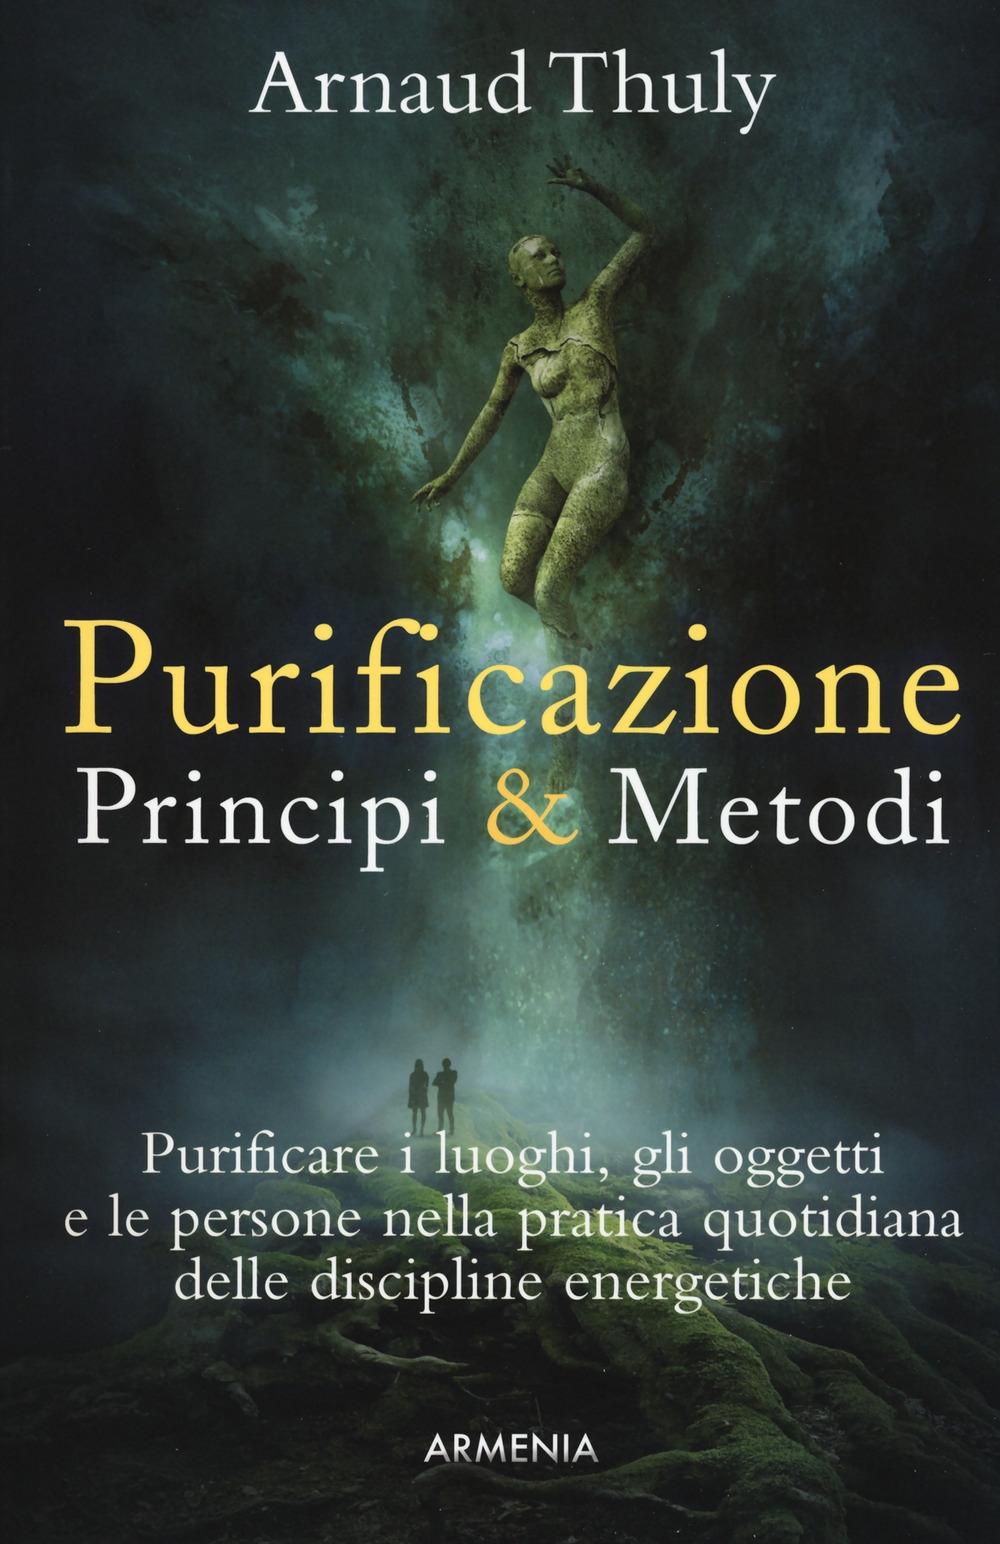 Purificazione. Principi & metodi